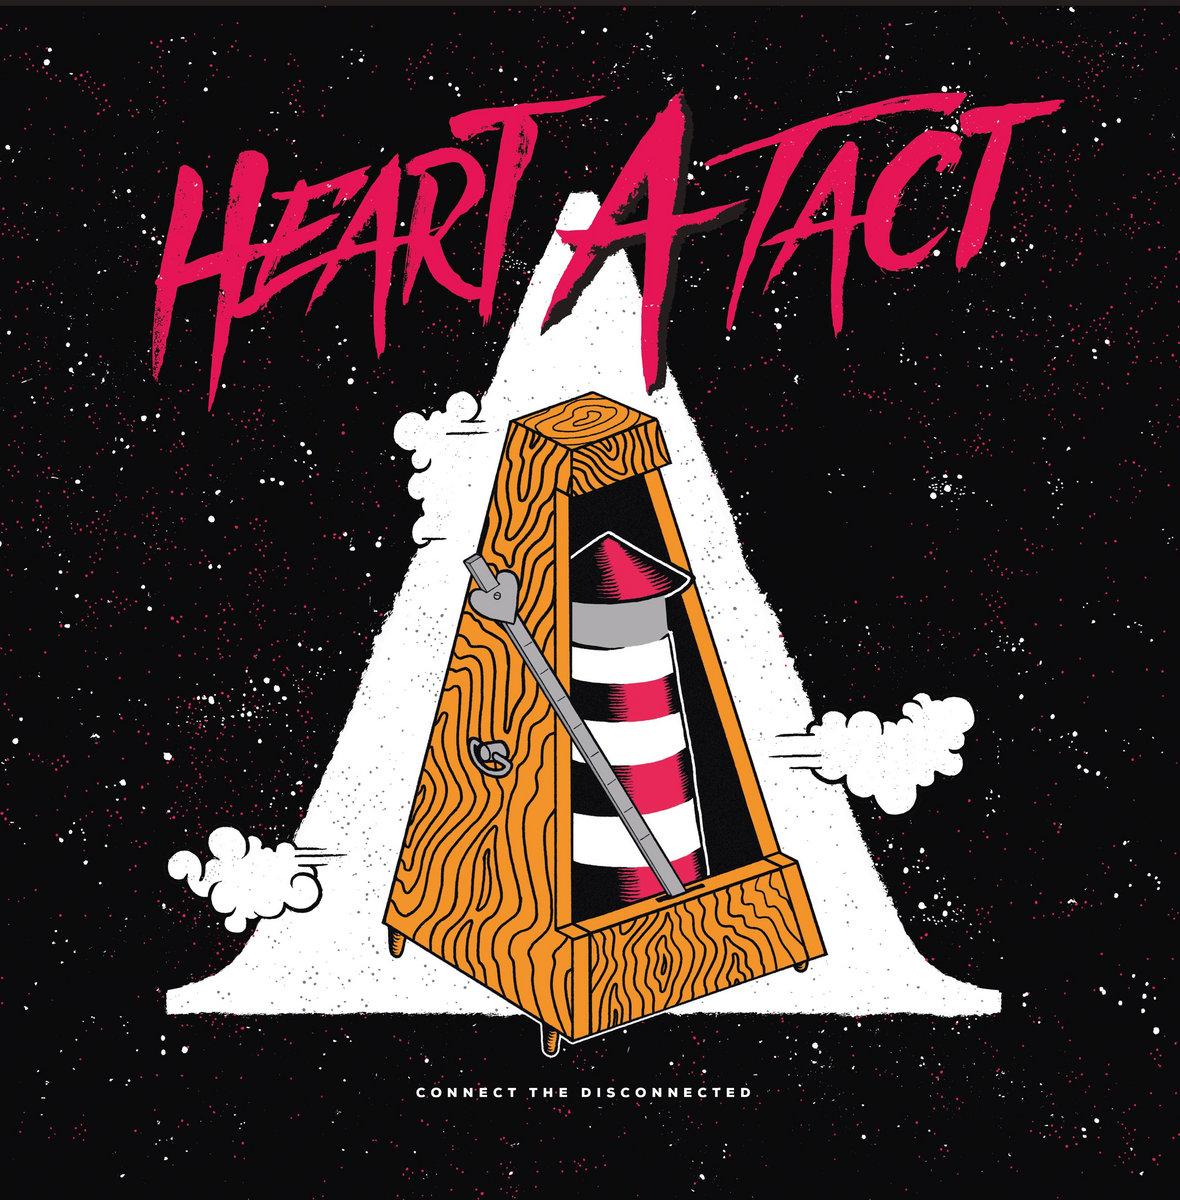 Heart A Tact